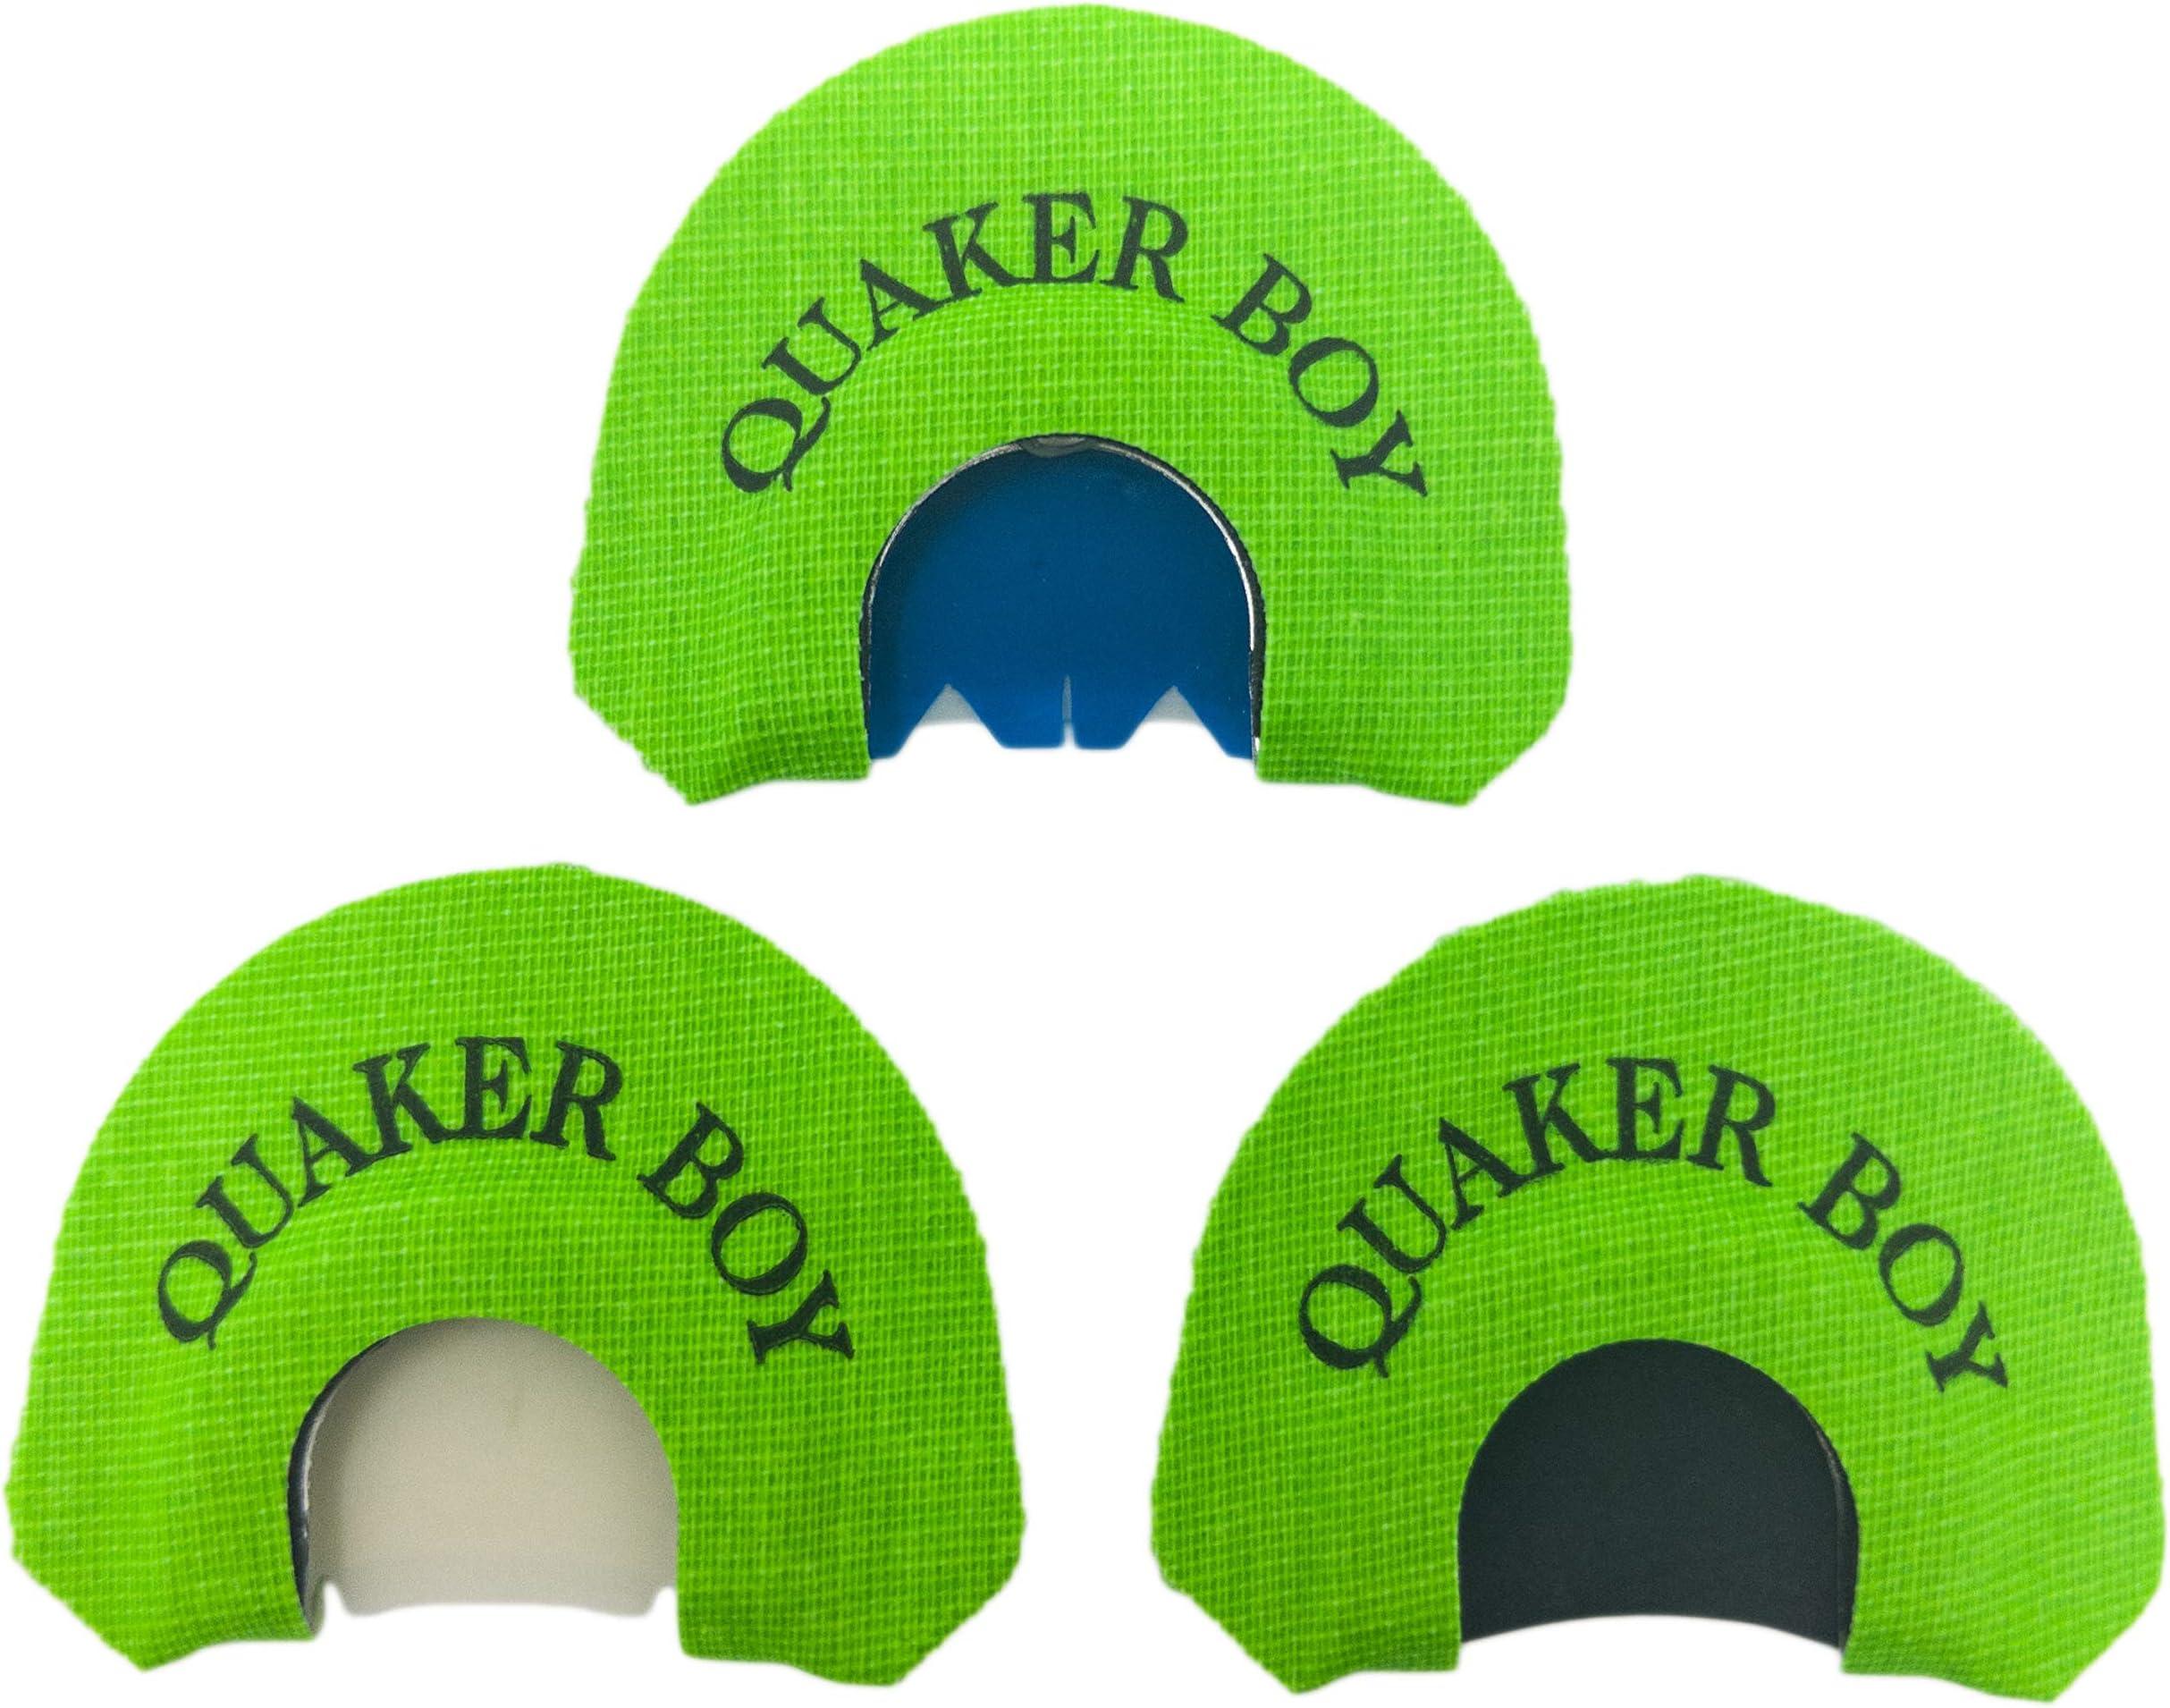 Quaker Boy Mouth Call Turkey Call You Choose Brand New You Choose Free Shipping